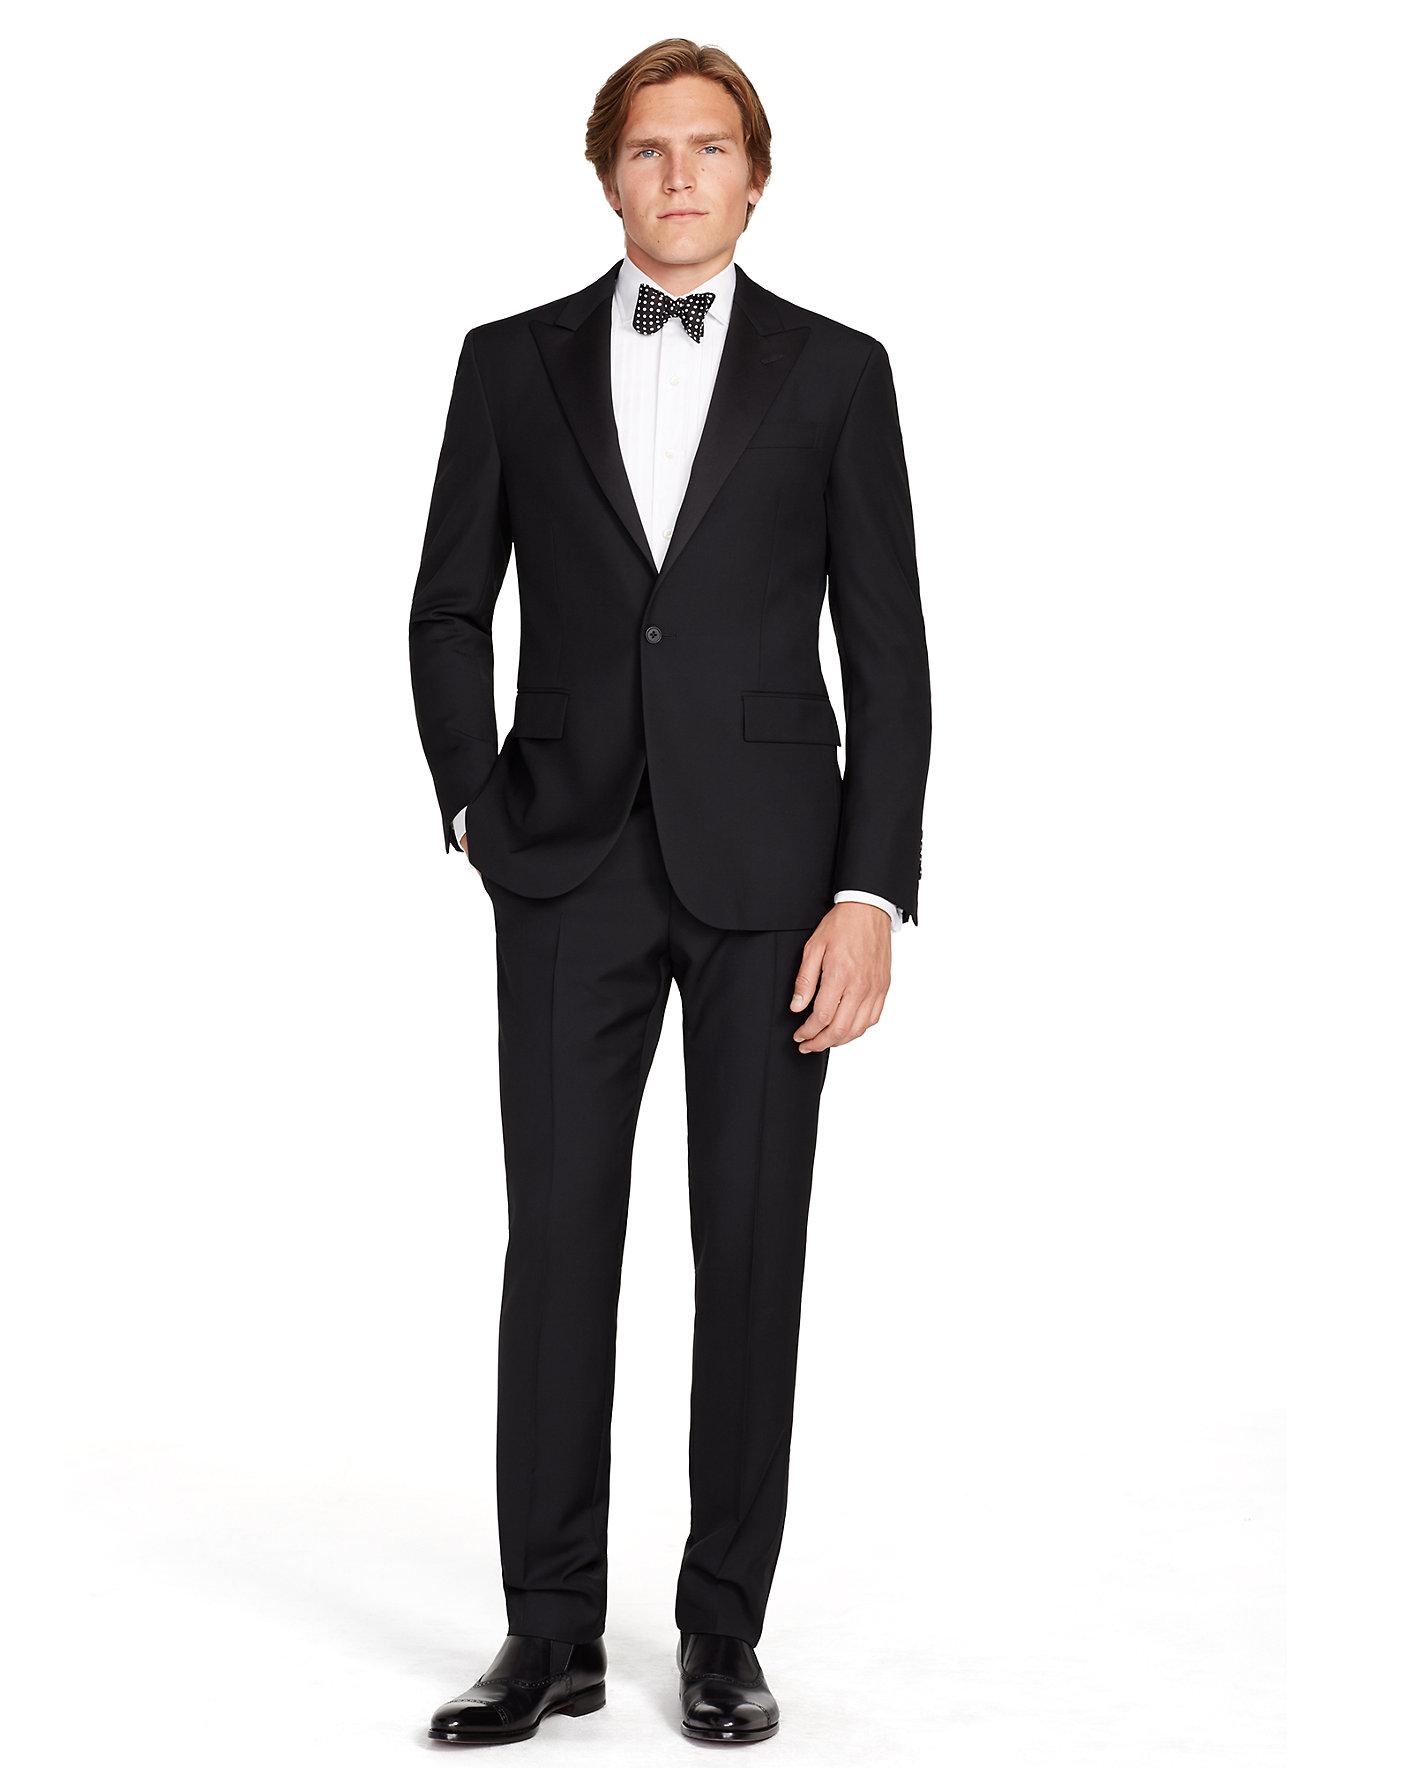 Ralph Lauren Latest Mens Fashion Suits Party Wear Formal Dresses Collection 2014-2015 (7)